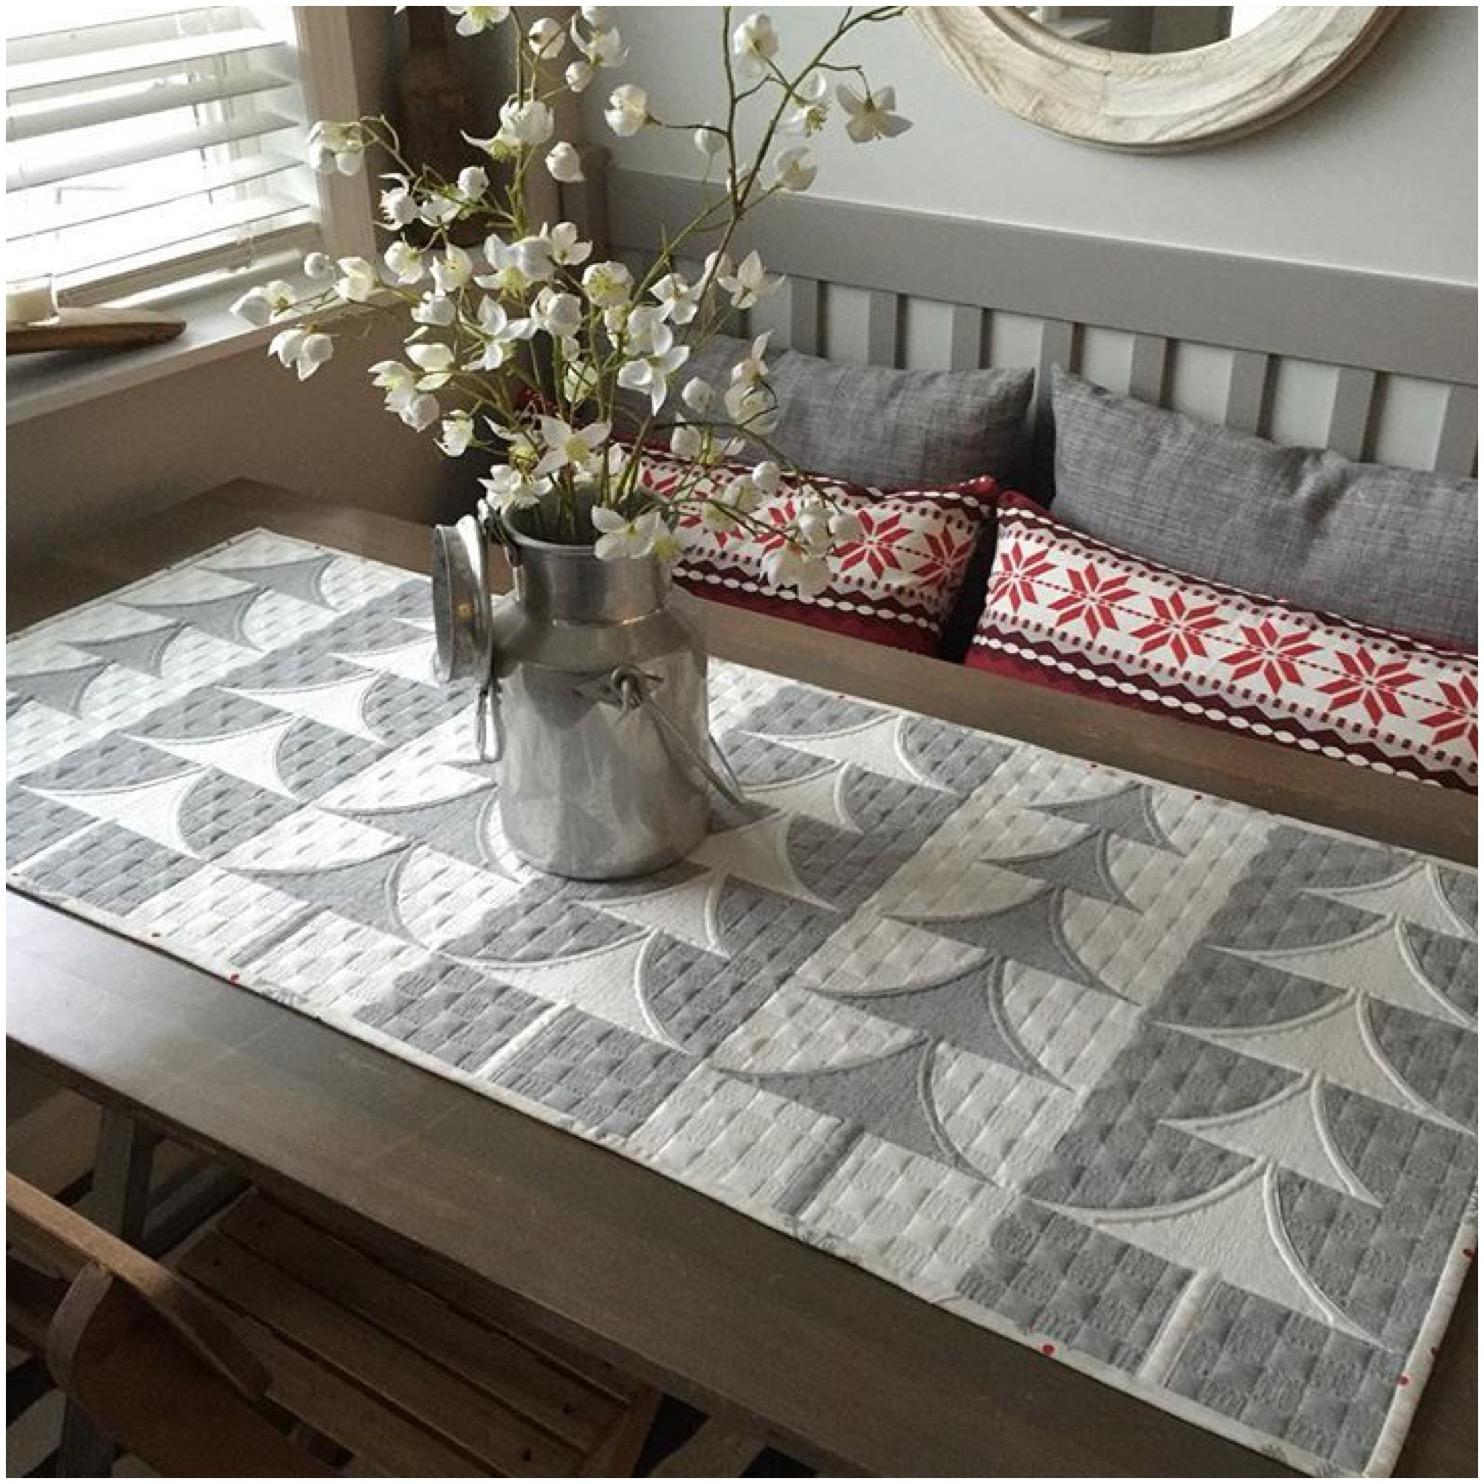 sew kind of wonderful free sew kind of wonderful patterns. Black Bedroom Furniture Sets. Home Design Ideas